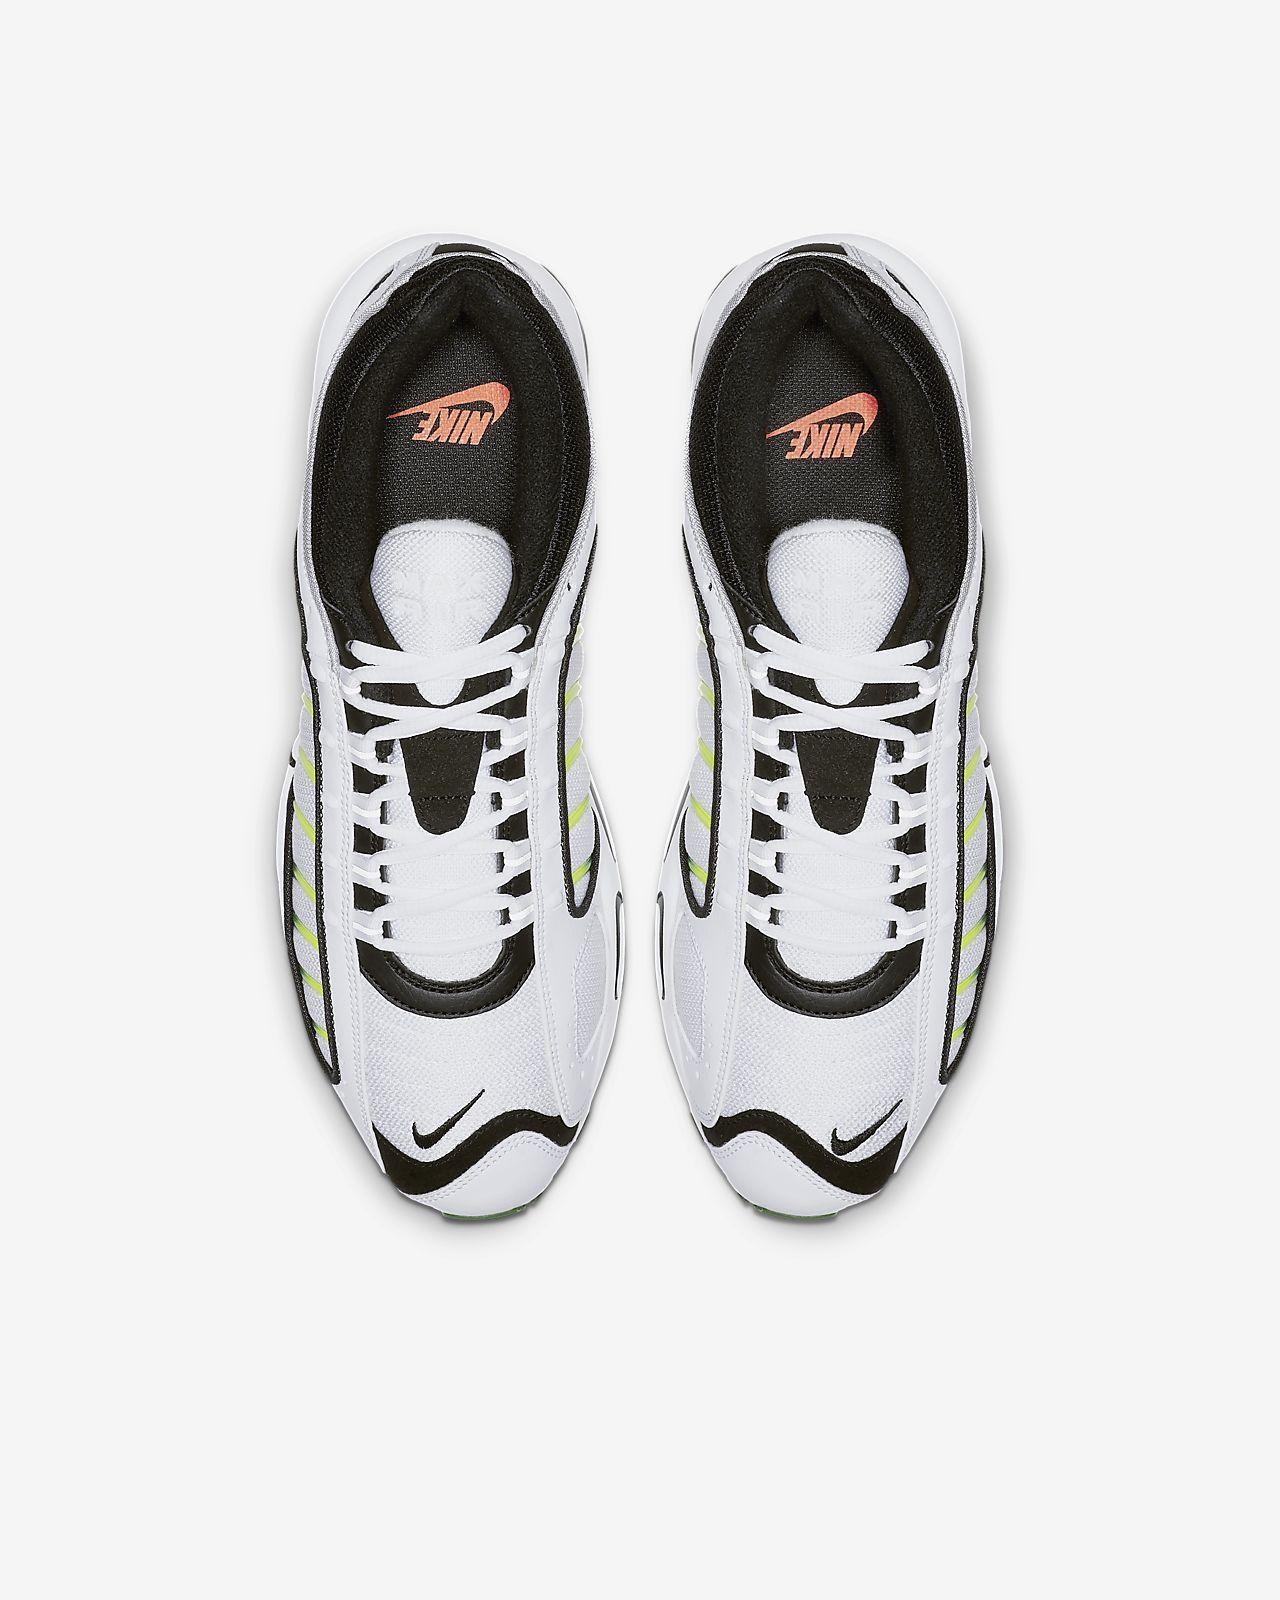 c2ad8b3b64 Nike Air Max Tailwind IV Men's Shoe. Nike.com